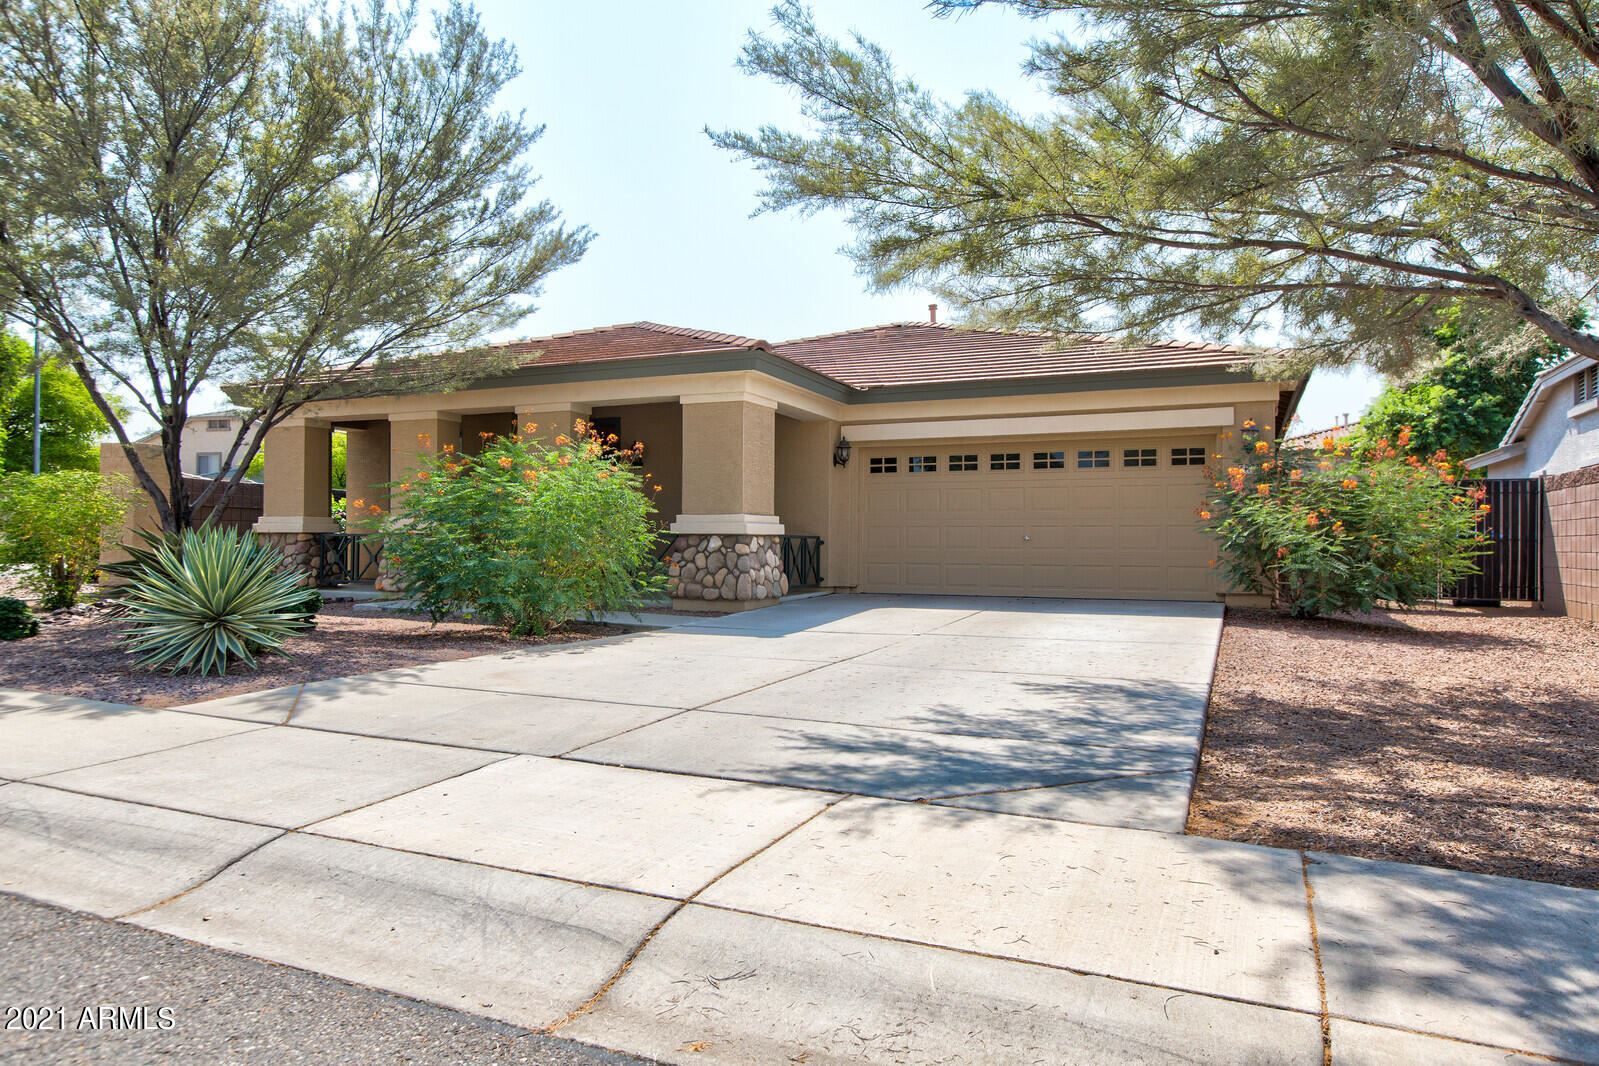 Photo of 13755 W MONTEREY Way, Avondale, AZ 85392 (MLS # 6294720)